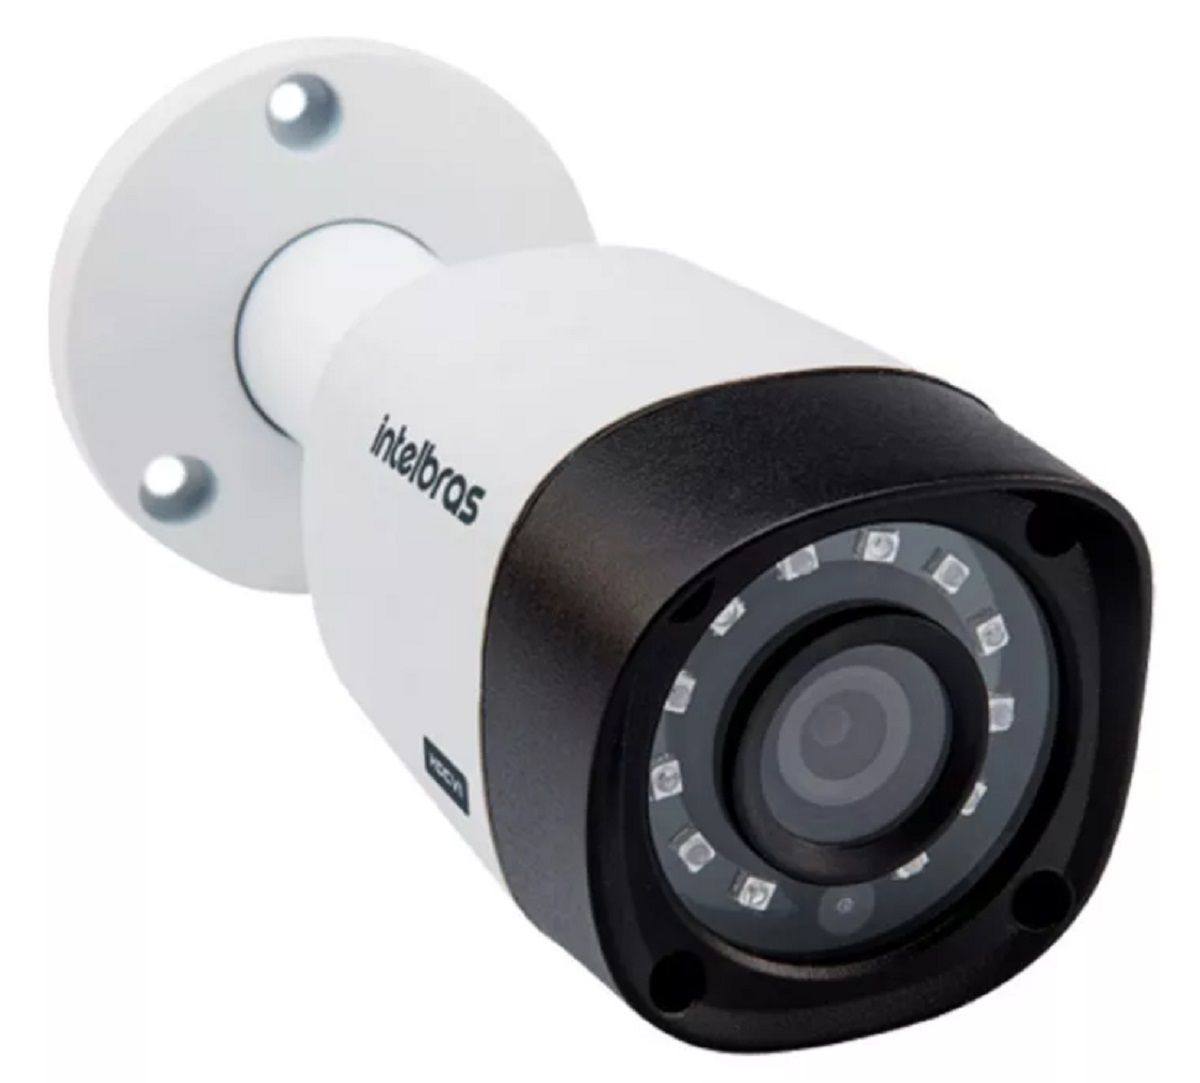 Câmera Infra Intelbras Vhd 3230b Full Hd Hdcvi 3,6 Mm